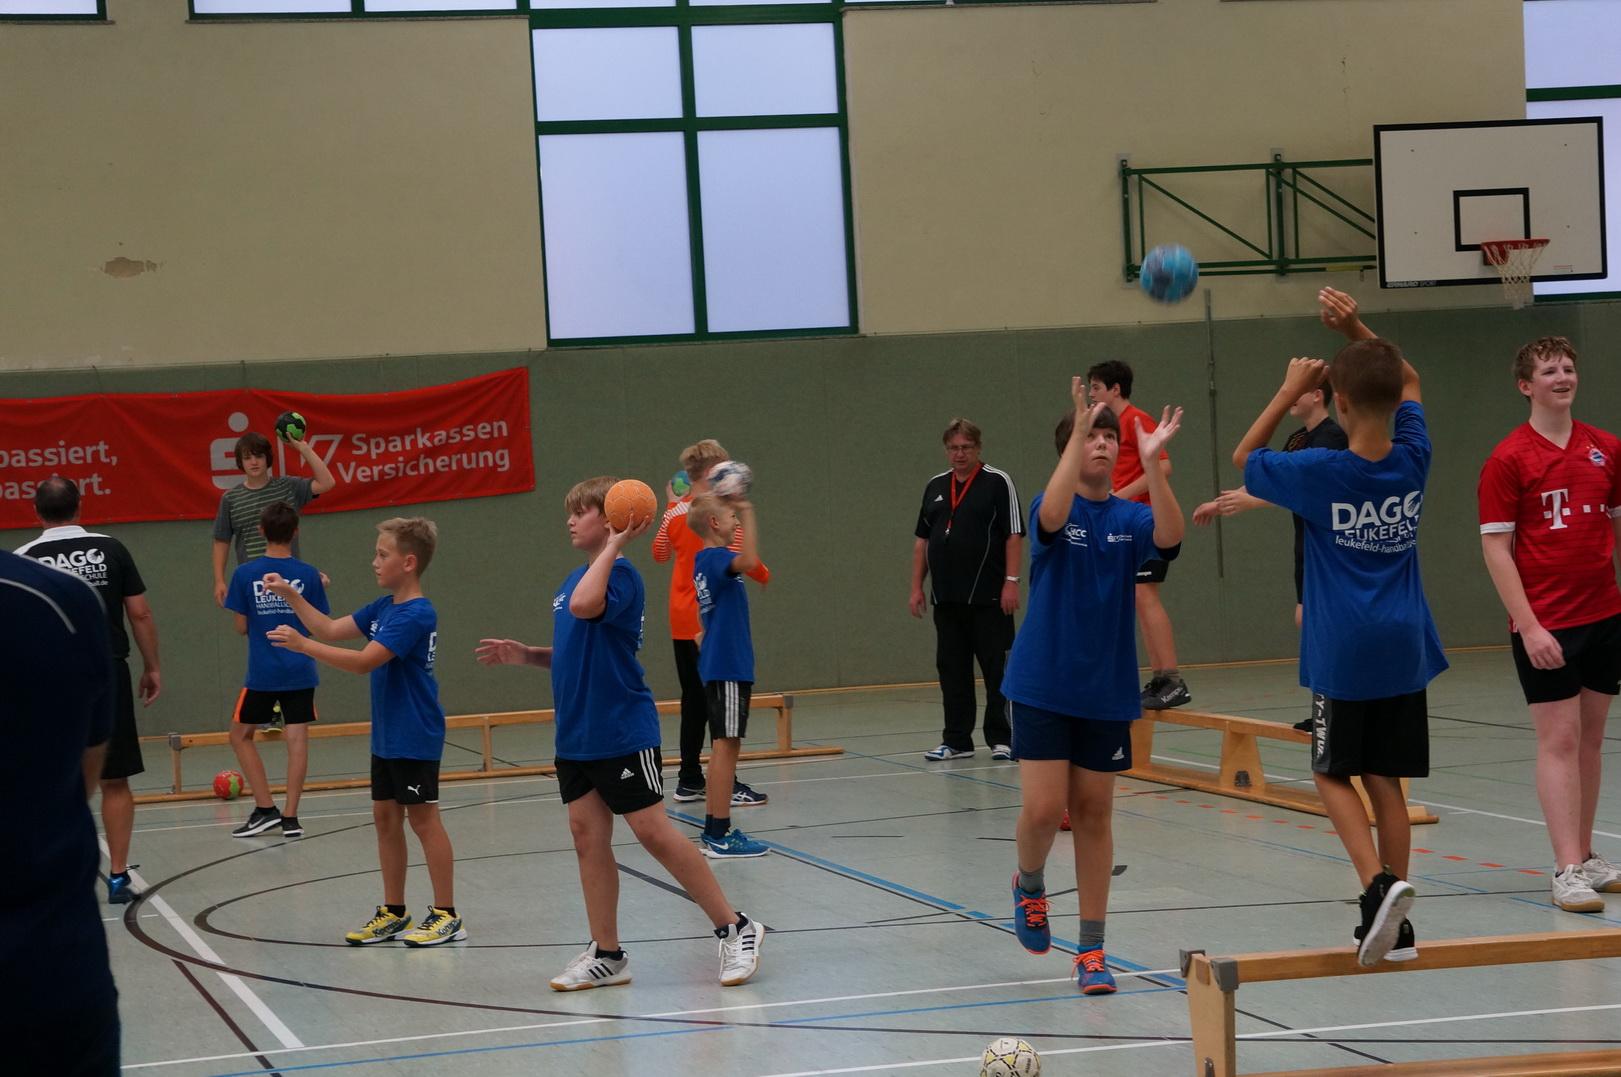 201808_Handballcamp_SDH_MG_171w